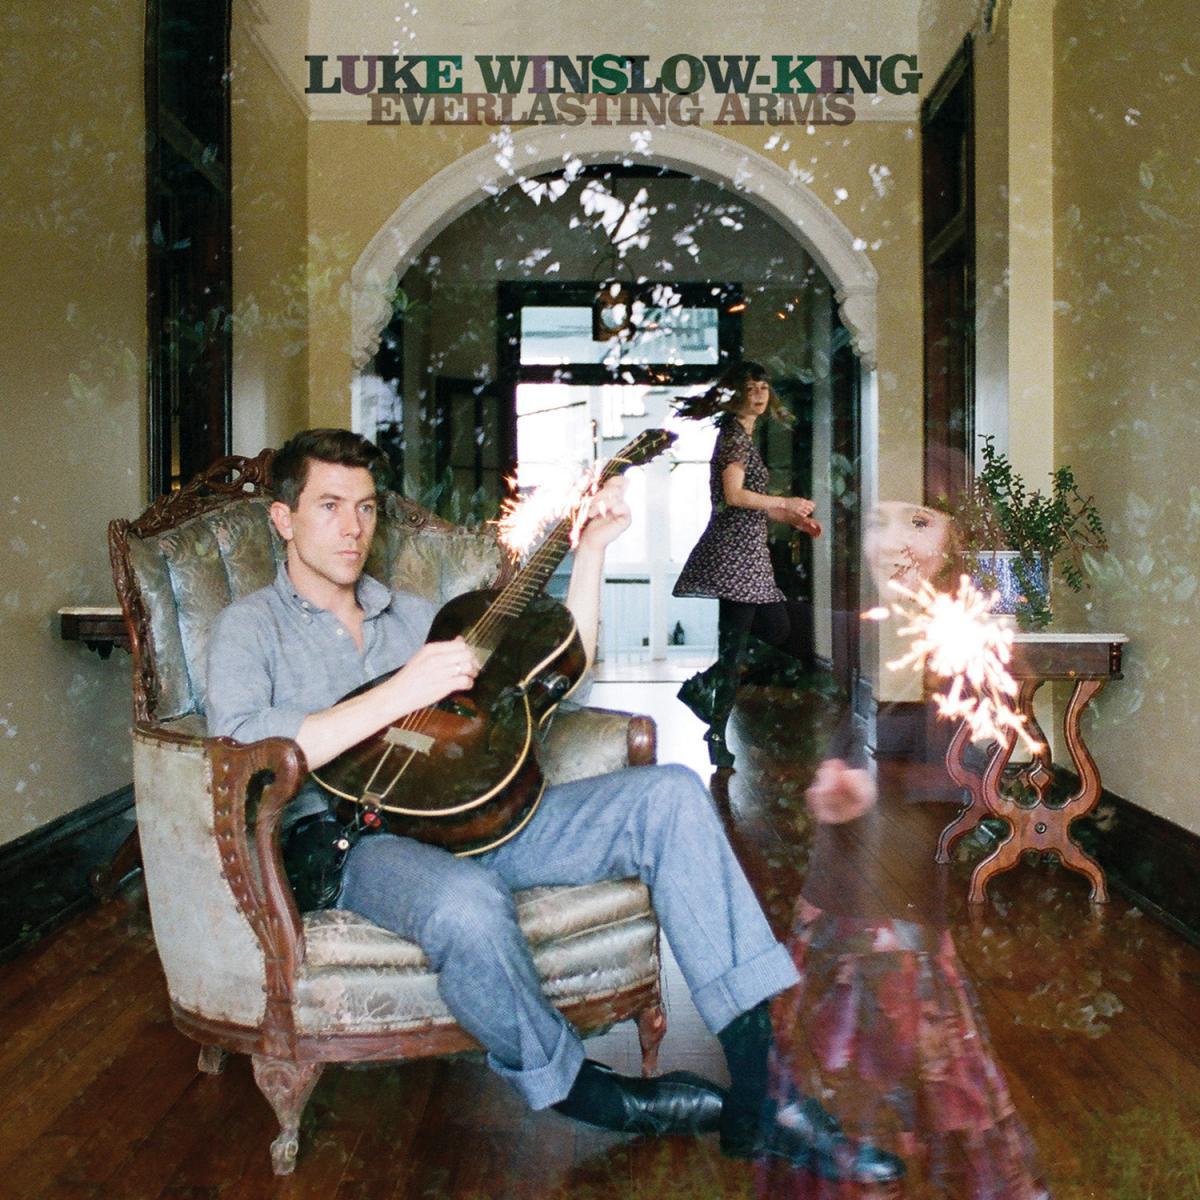 luke-winslow-king-everlasting-arms